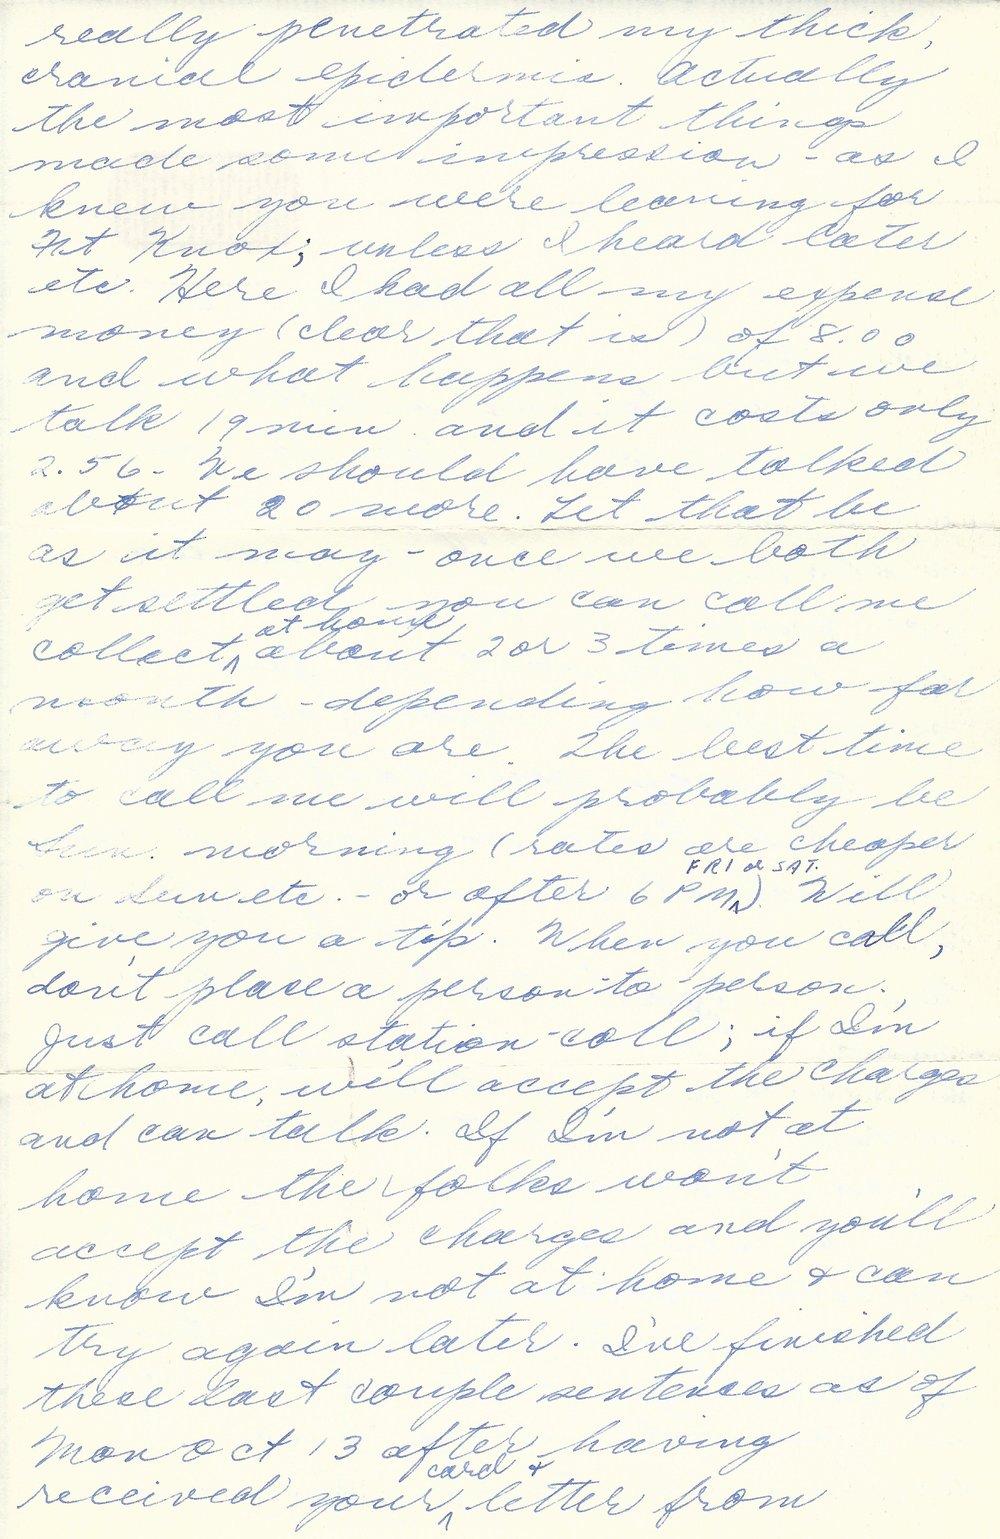 7. Oct. 9-21, 1952 (Oma)_Page_03.jpg